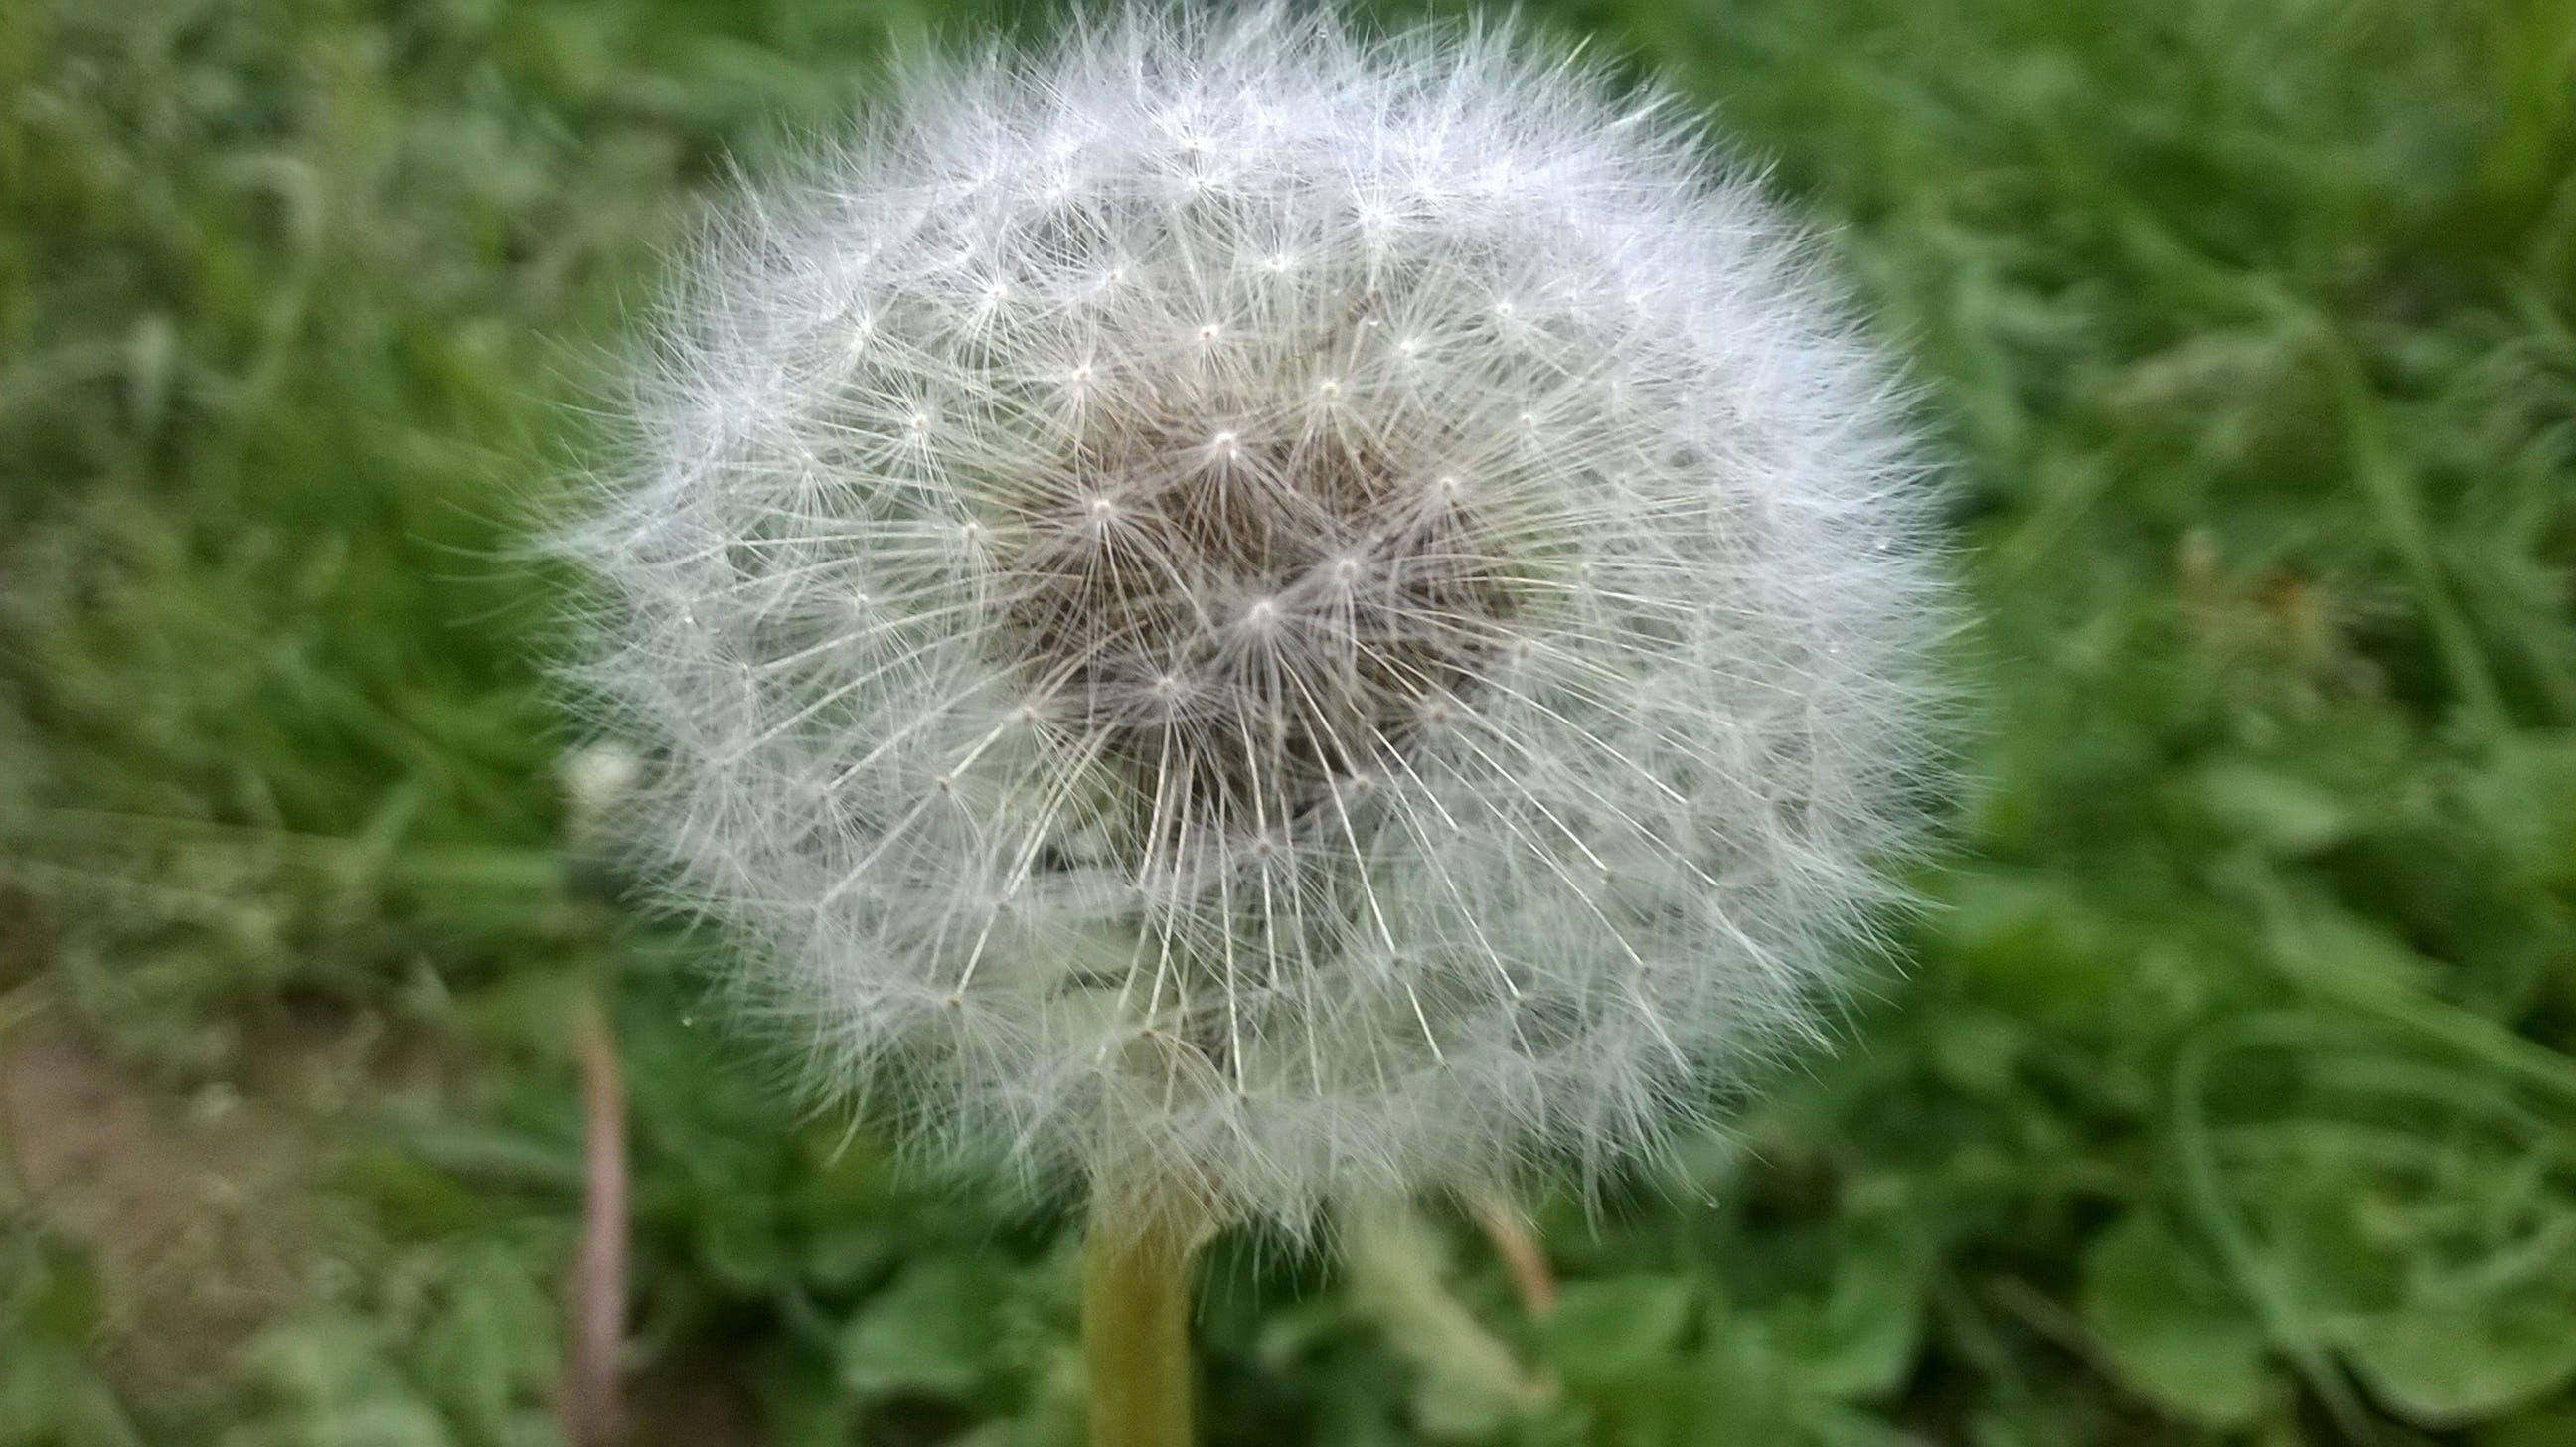 Dandelion in Shallow Photo